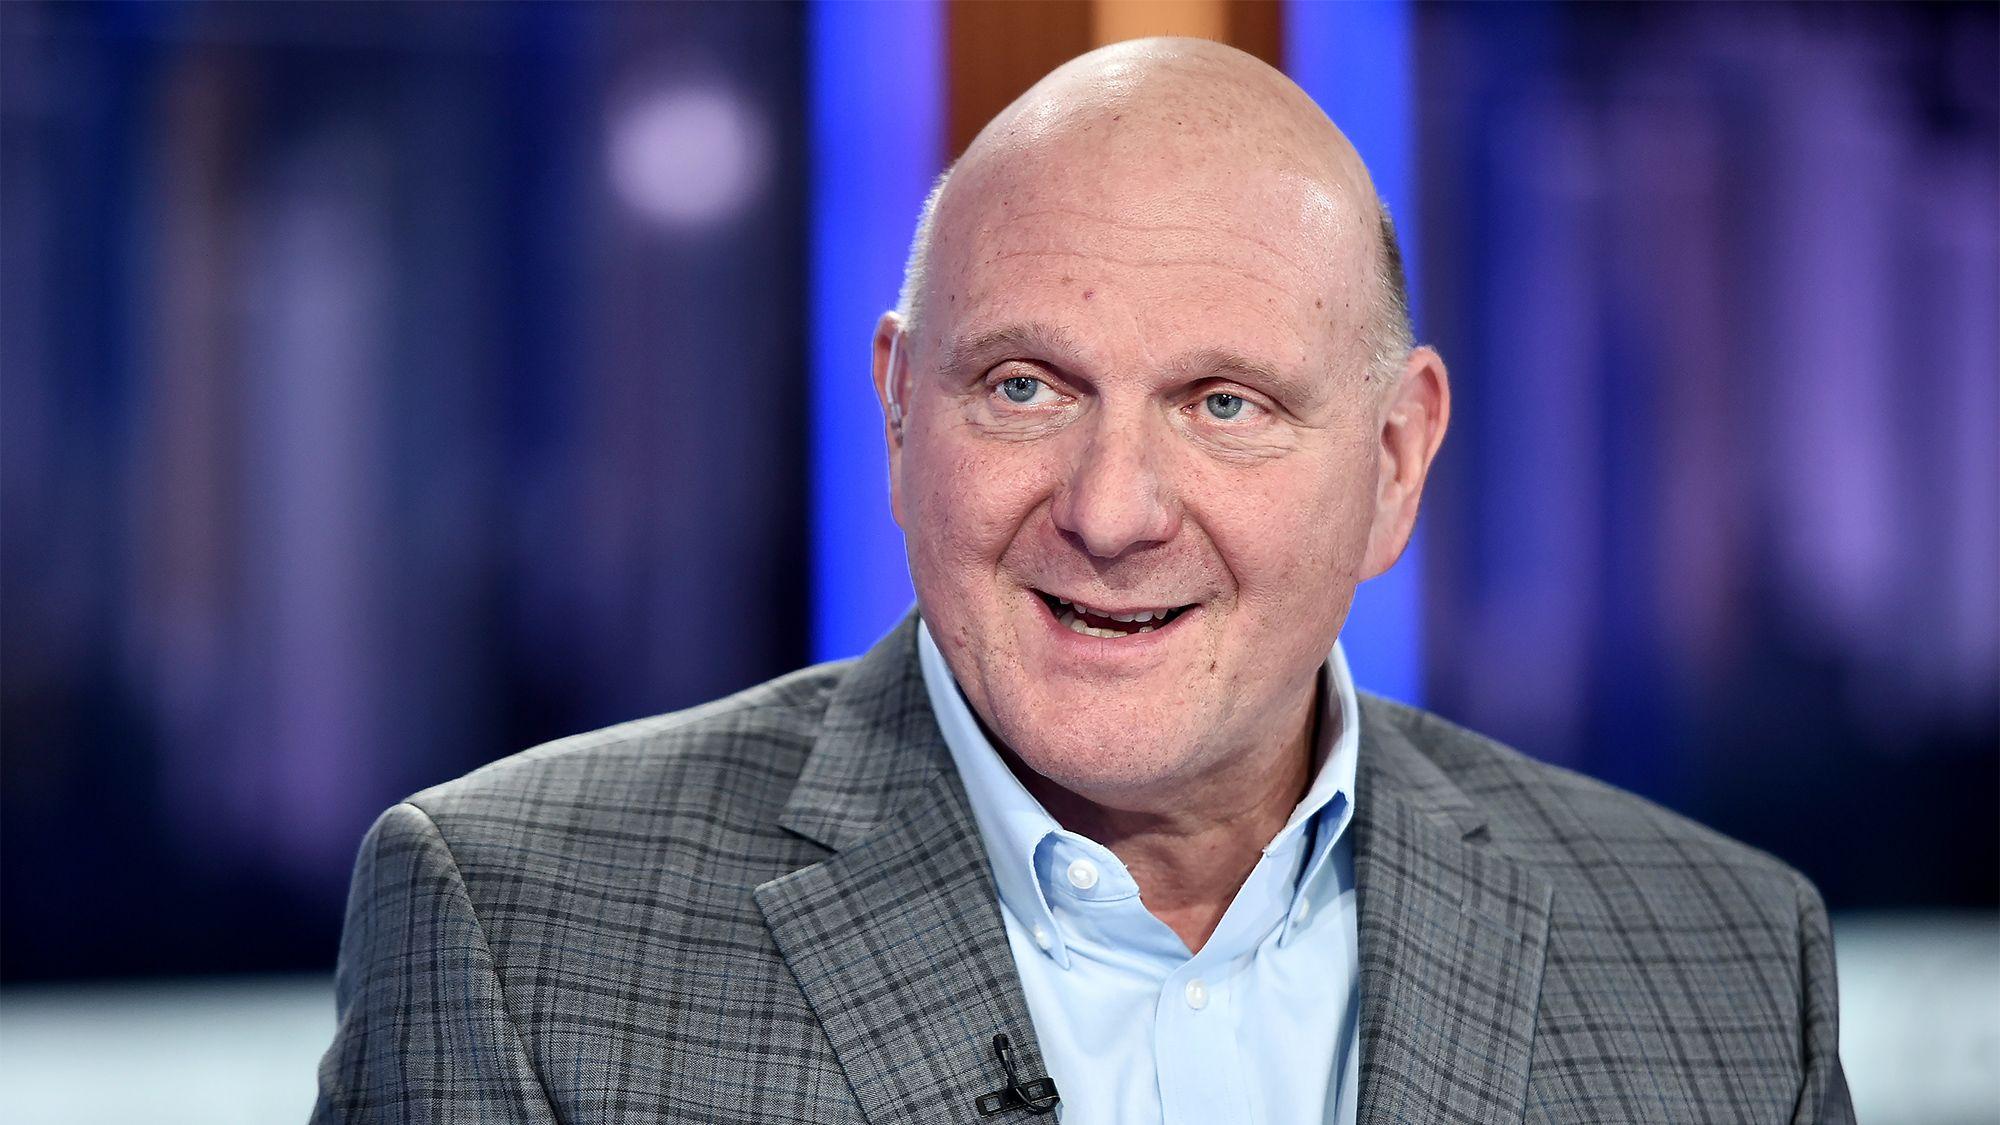 Former Microsoft Ceo Steve Ballmer Buys Another Home In Hunts Point Wa In 2020 Steve Ballmer Steve Rich People